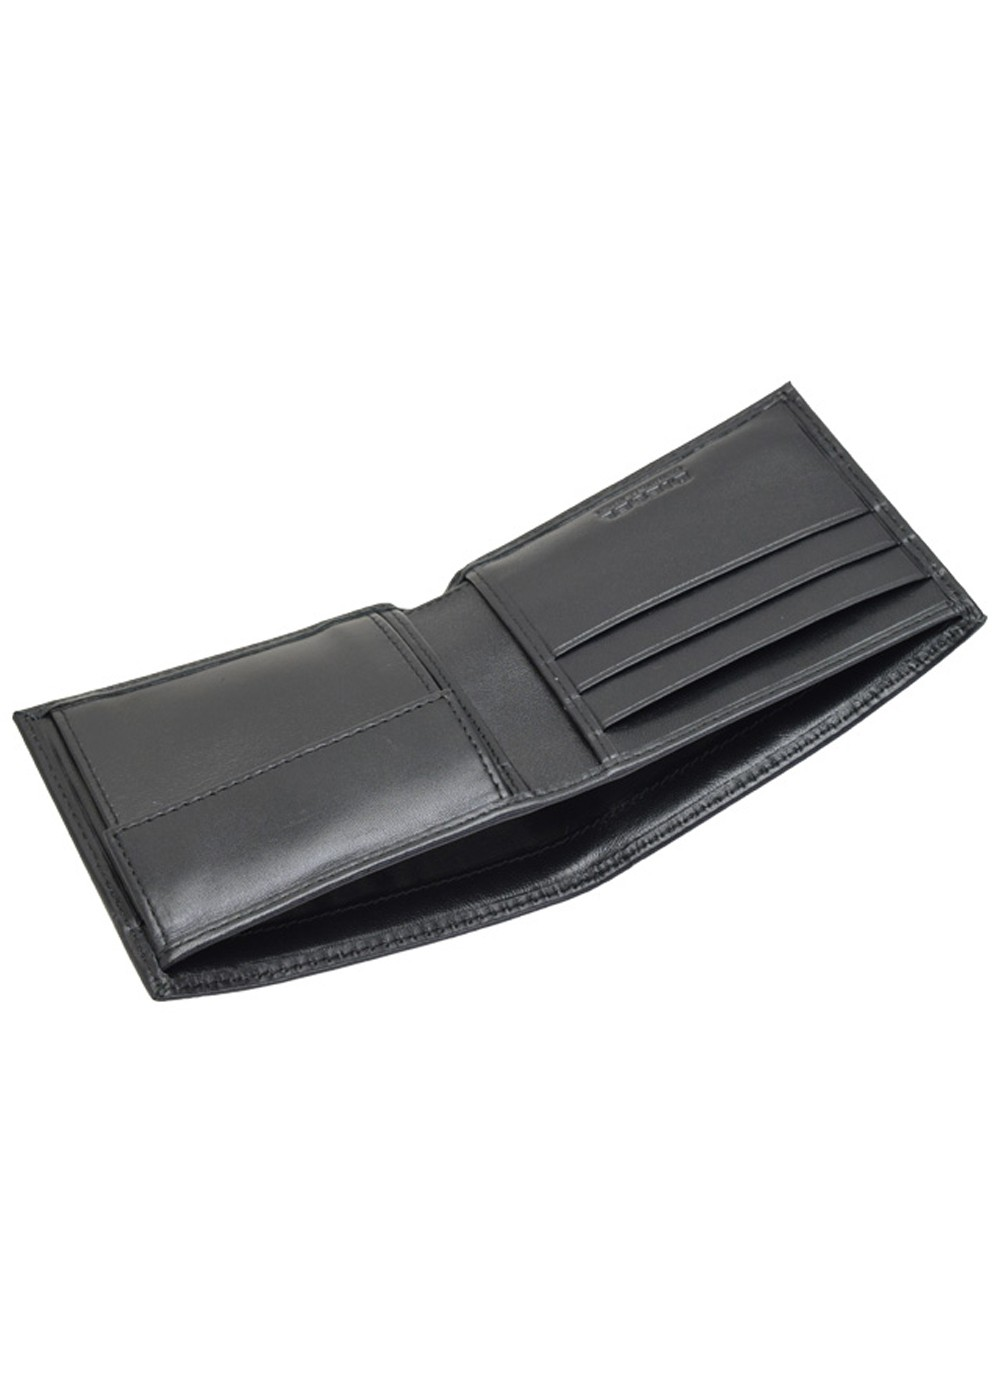 8d26f8d3db92 DIESEL】メンズ 財布 二つ折り x05081|Black/ブラック|メンズ雑貨|DIESEL ...